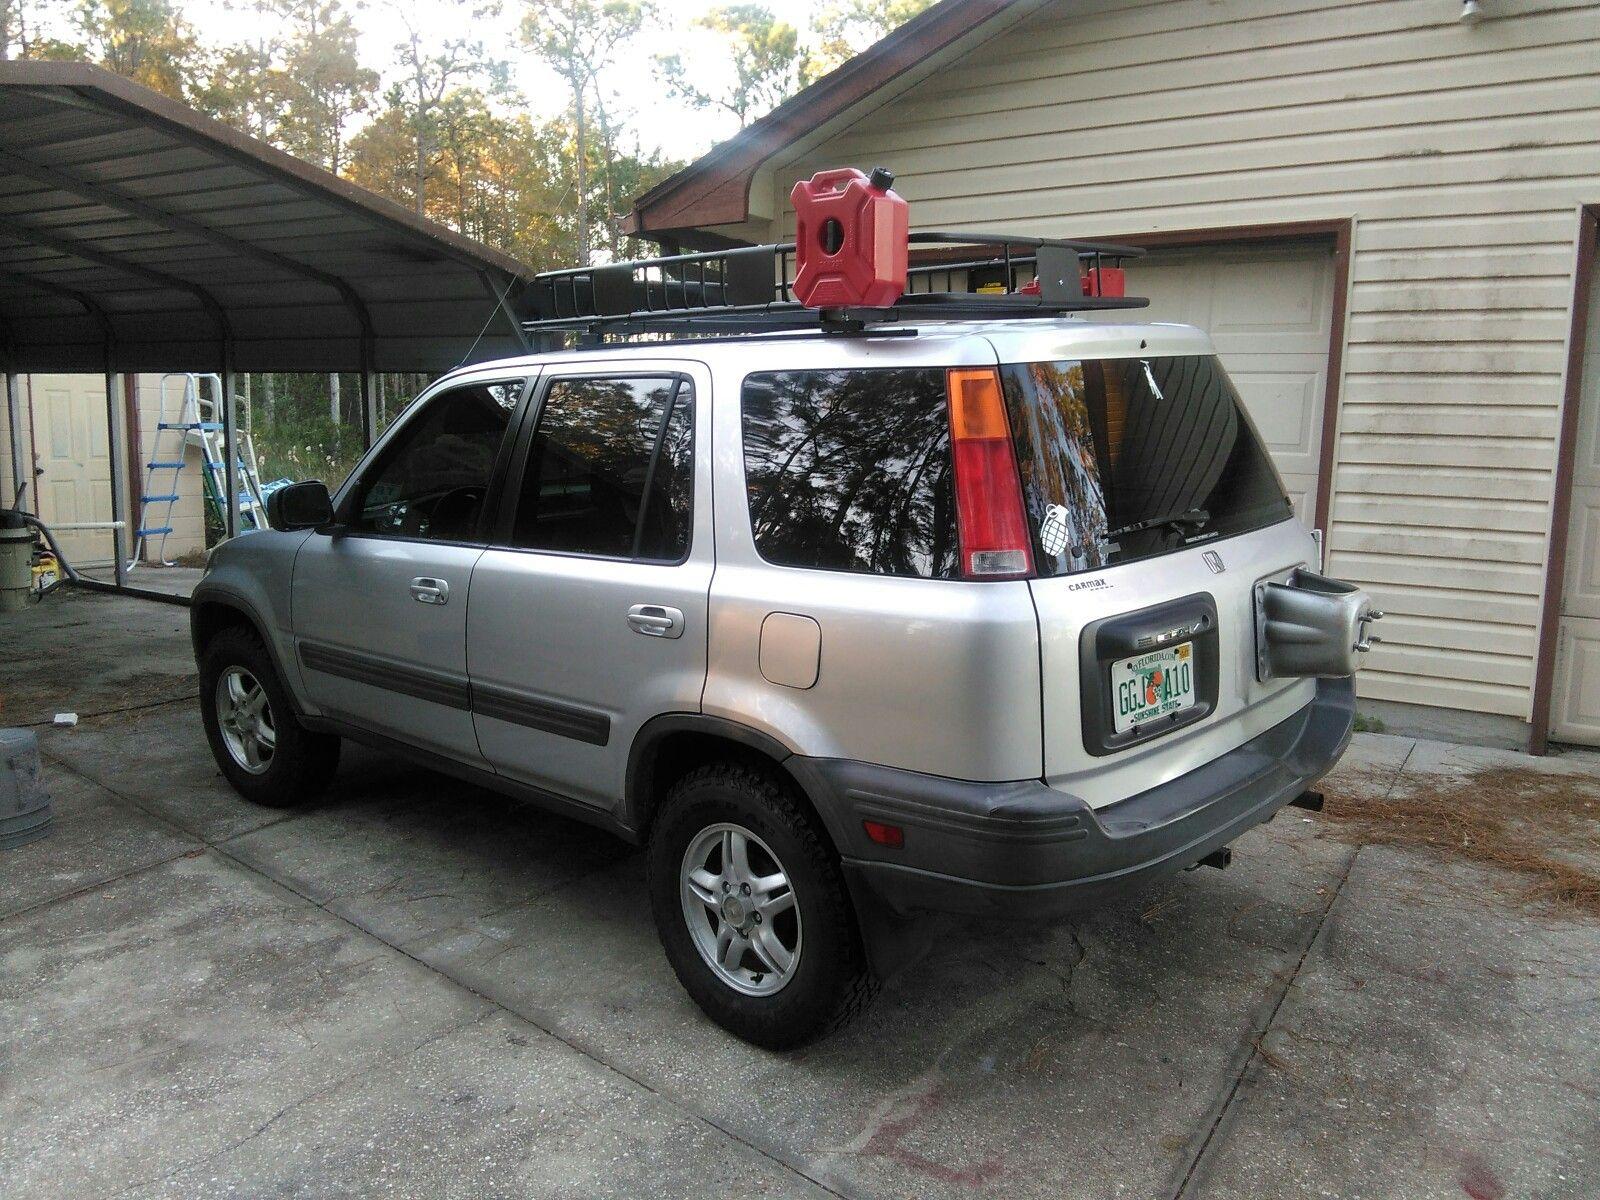 99 Honda Crv, Custom Spring Spacer Lift, Roof Rack, Snorkel And A Bunch